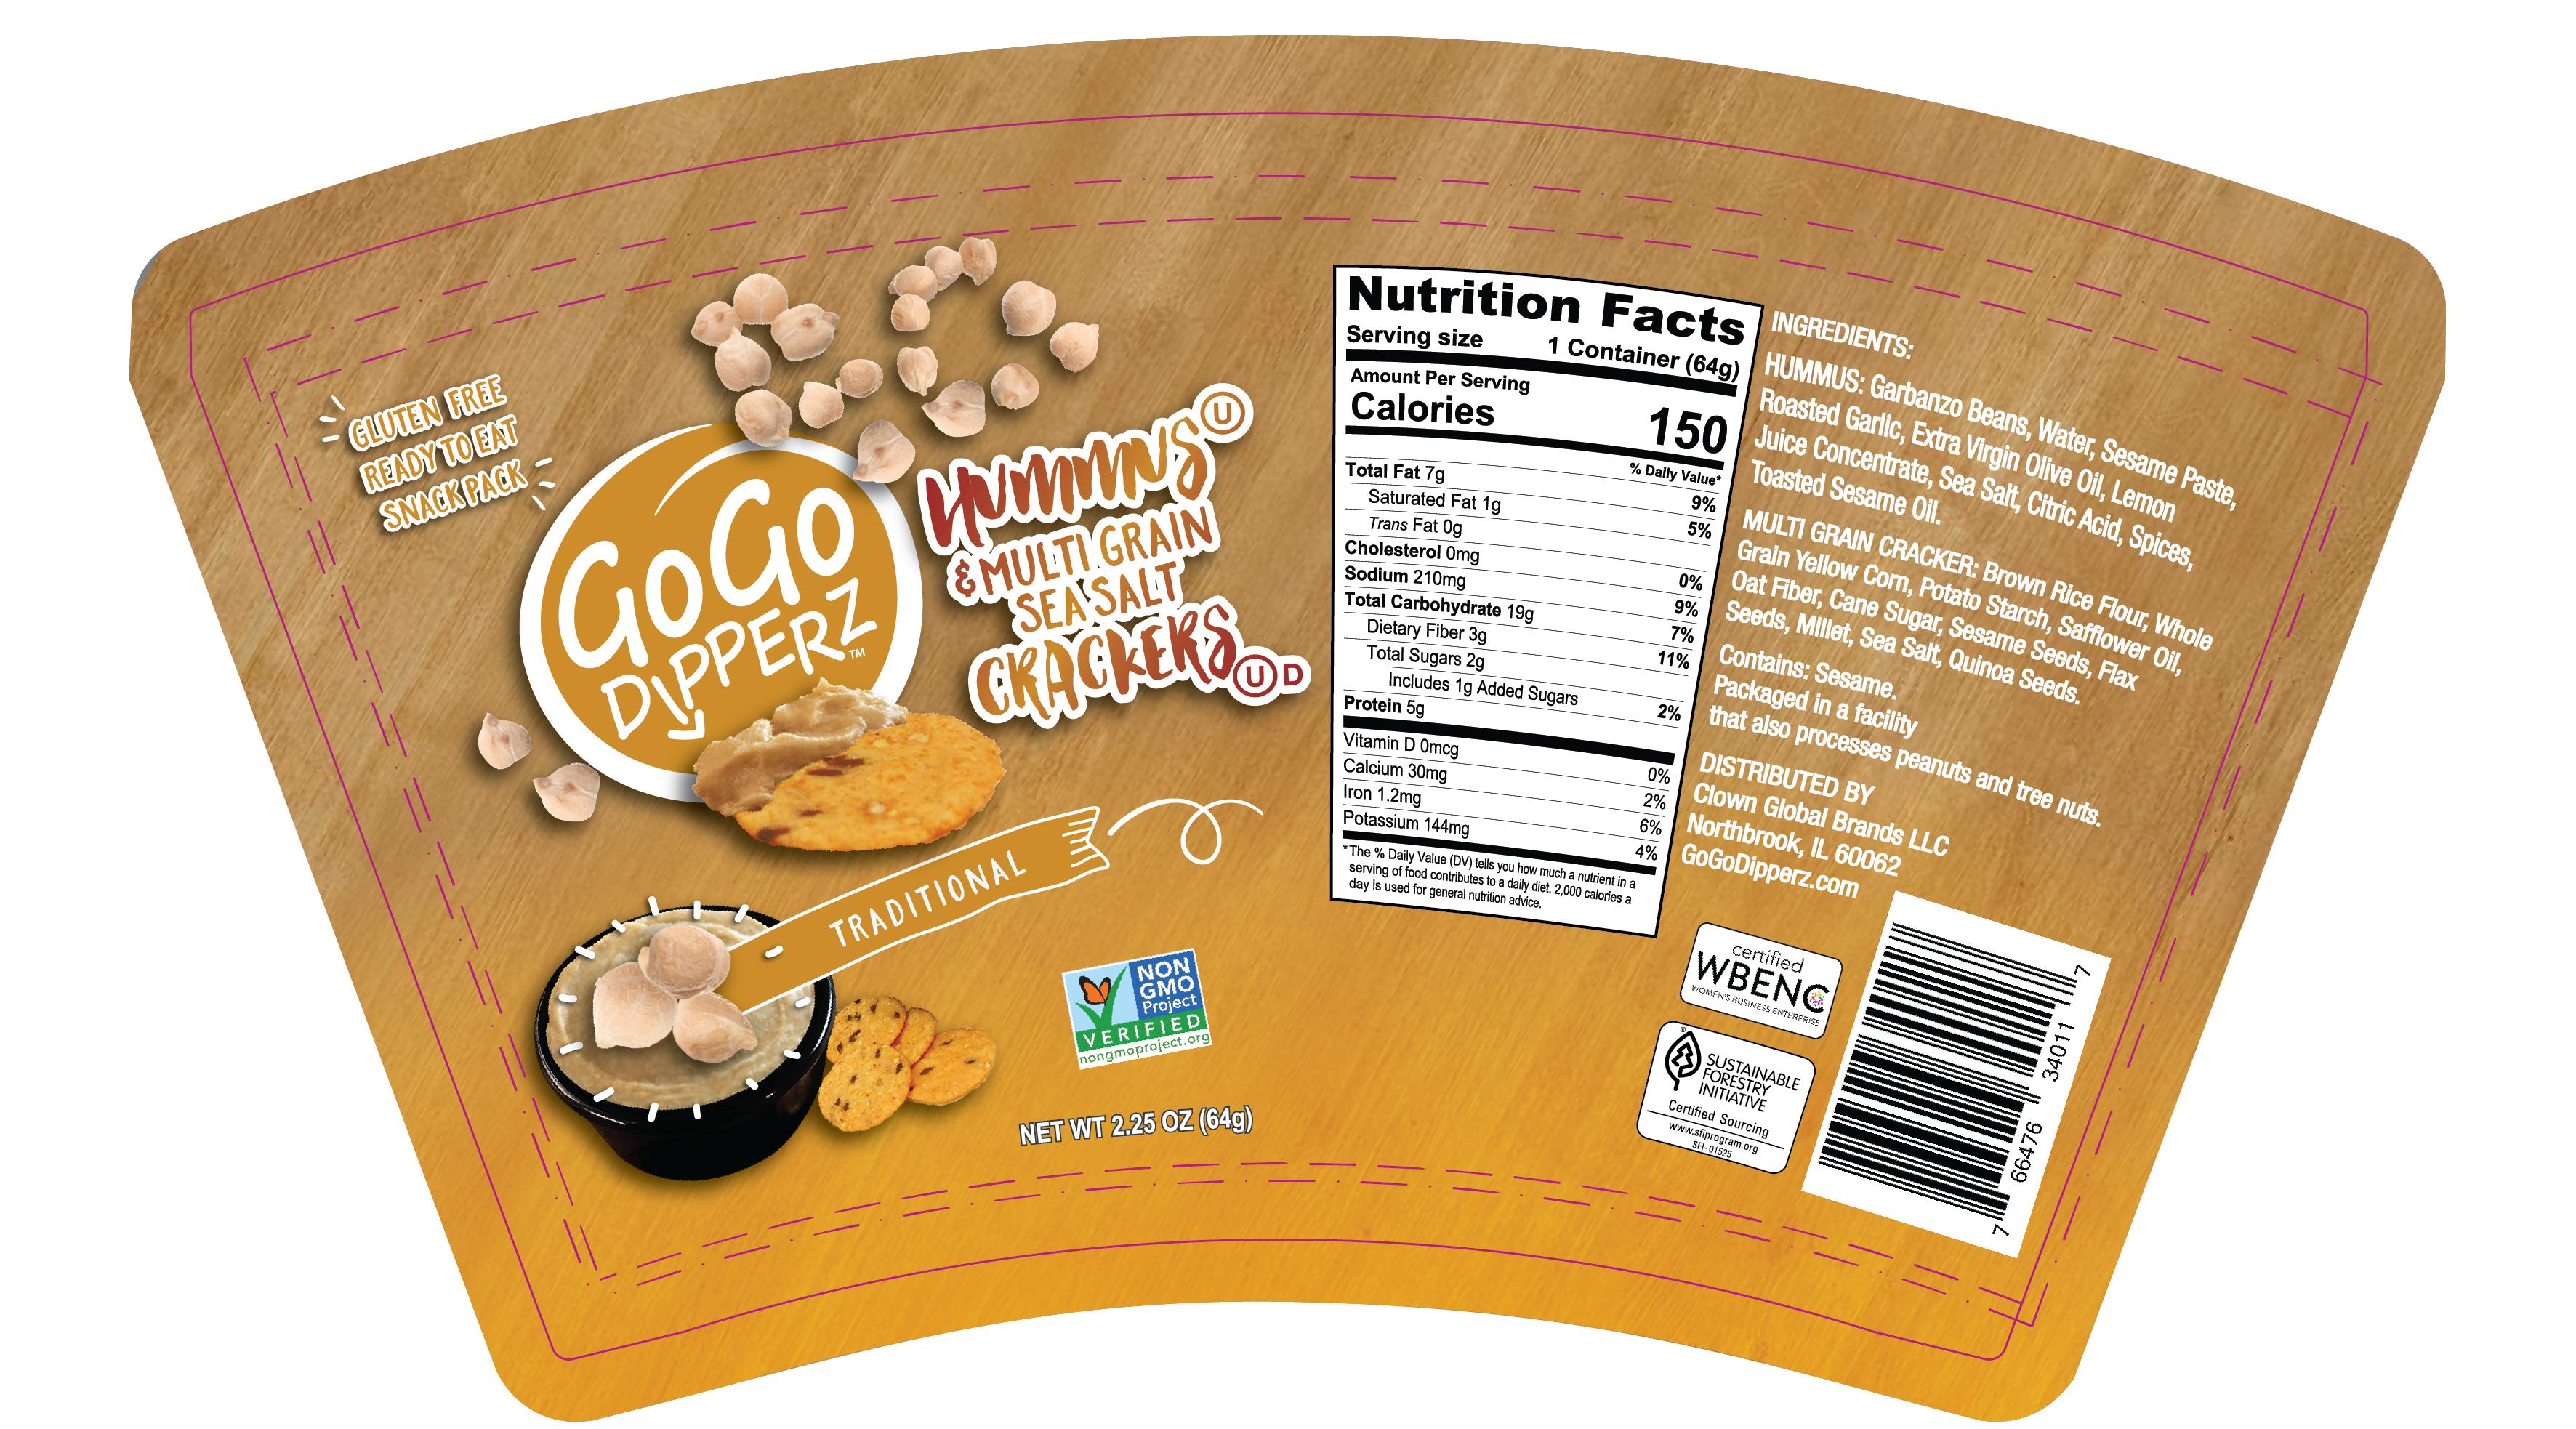 Hummus and Black Bean Snack Pack Designs (4-flavors)